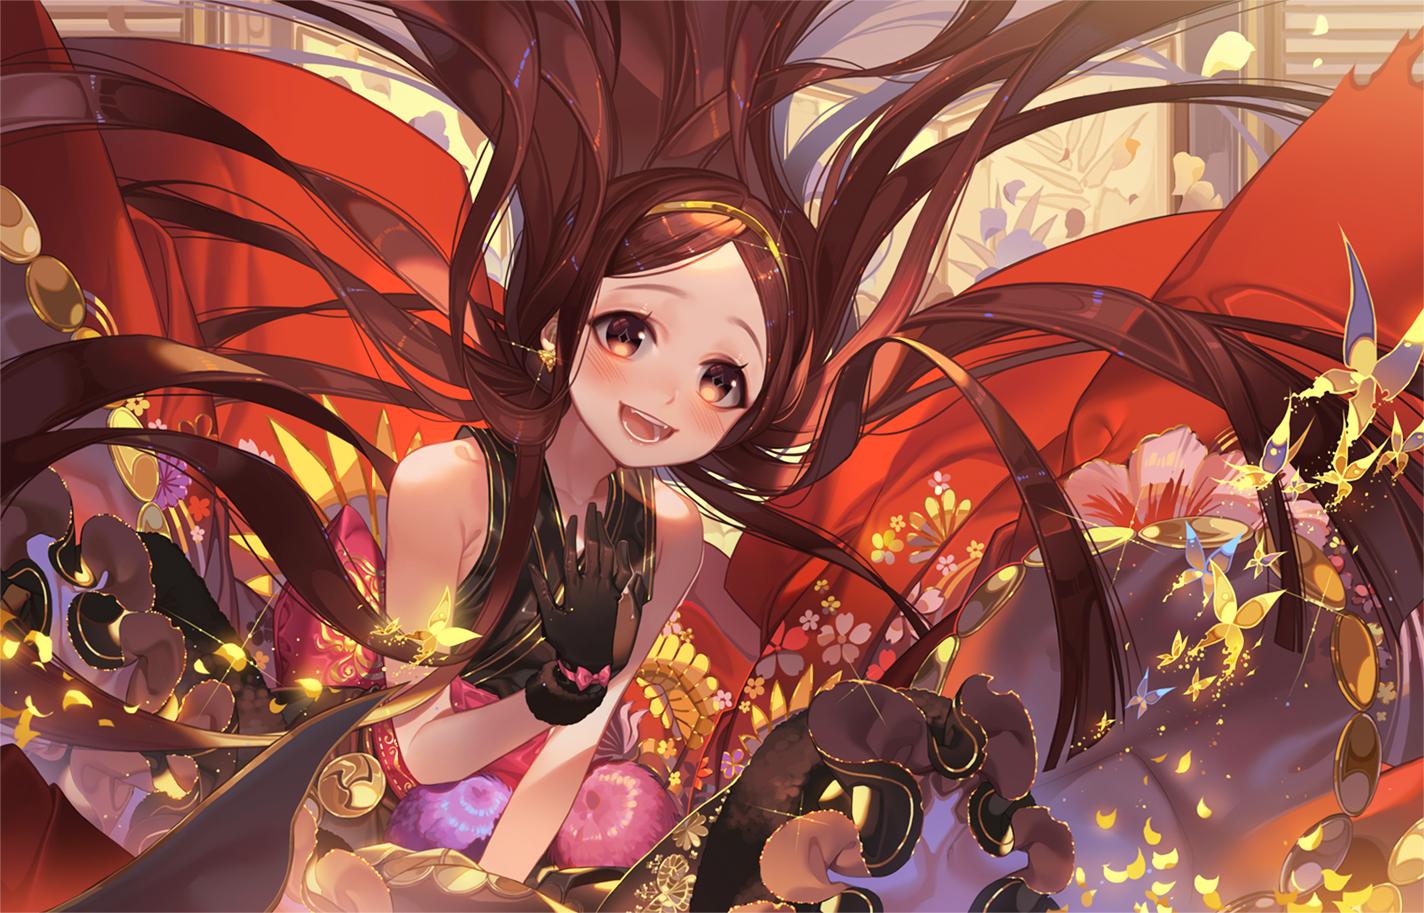 Berserker Chacha Fategrand Order Zerochan Anime Image